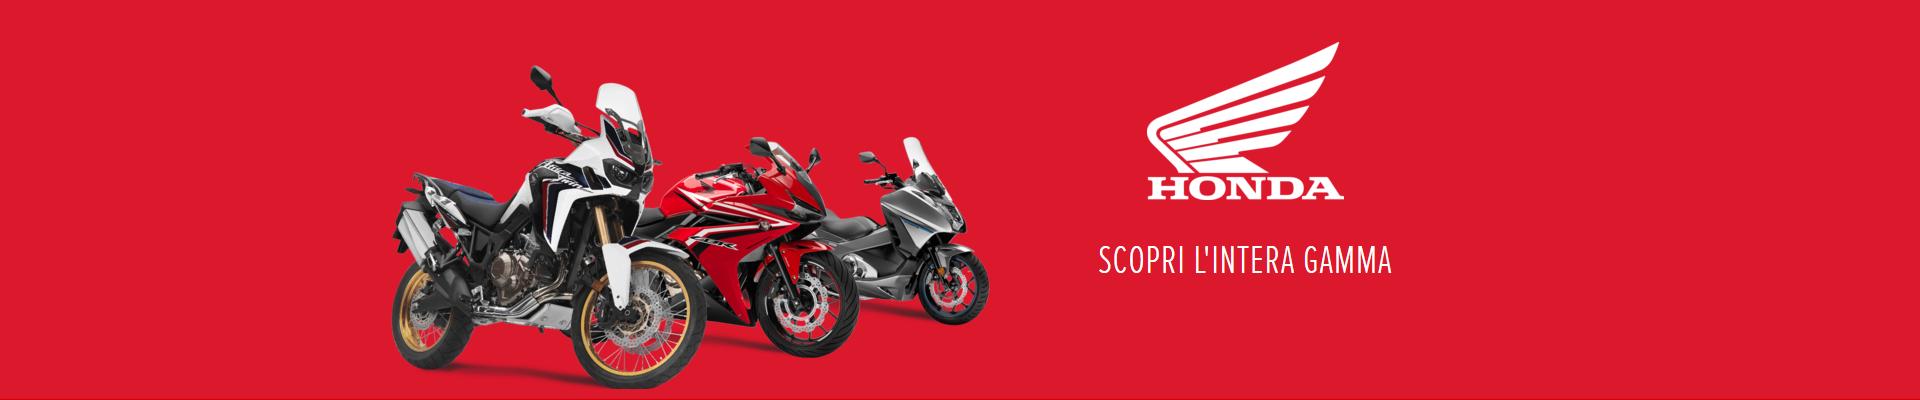 Janua Service Concessionario Honda Moto Scooter Usati Nuovi